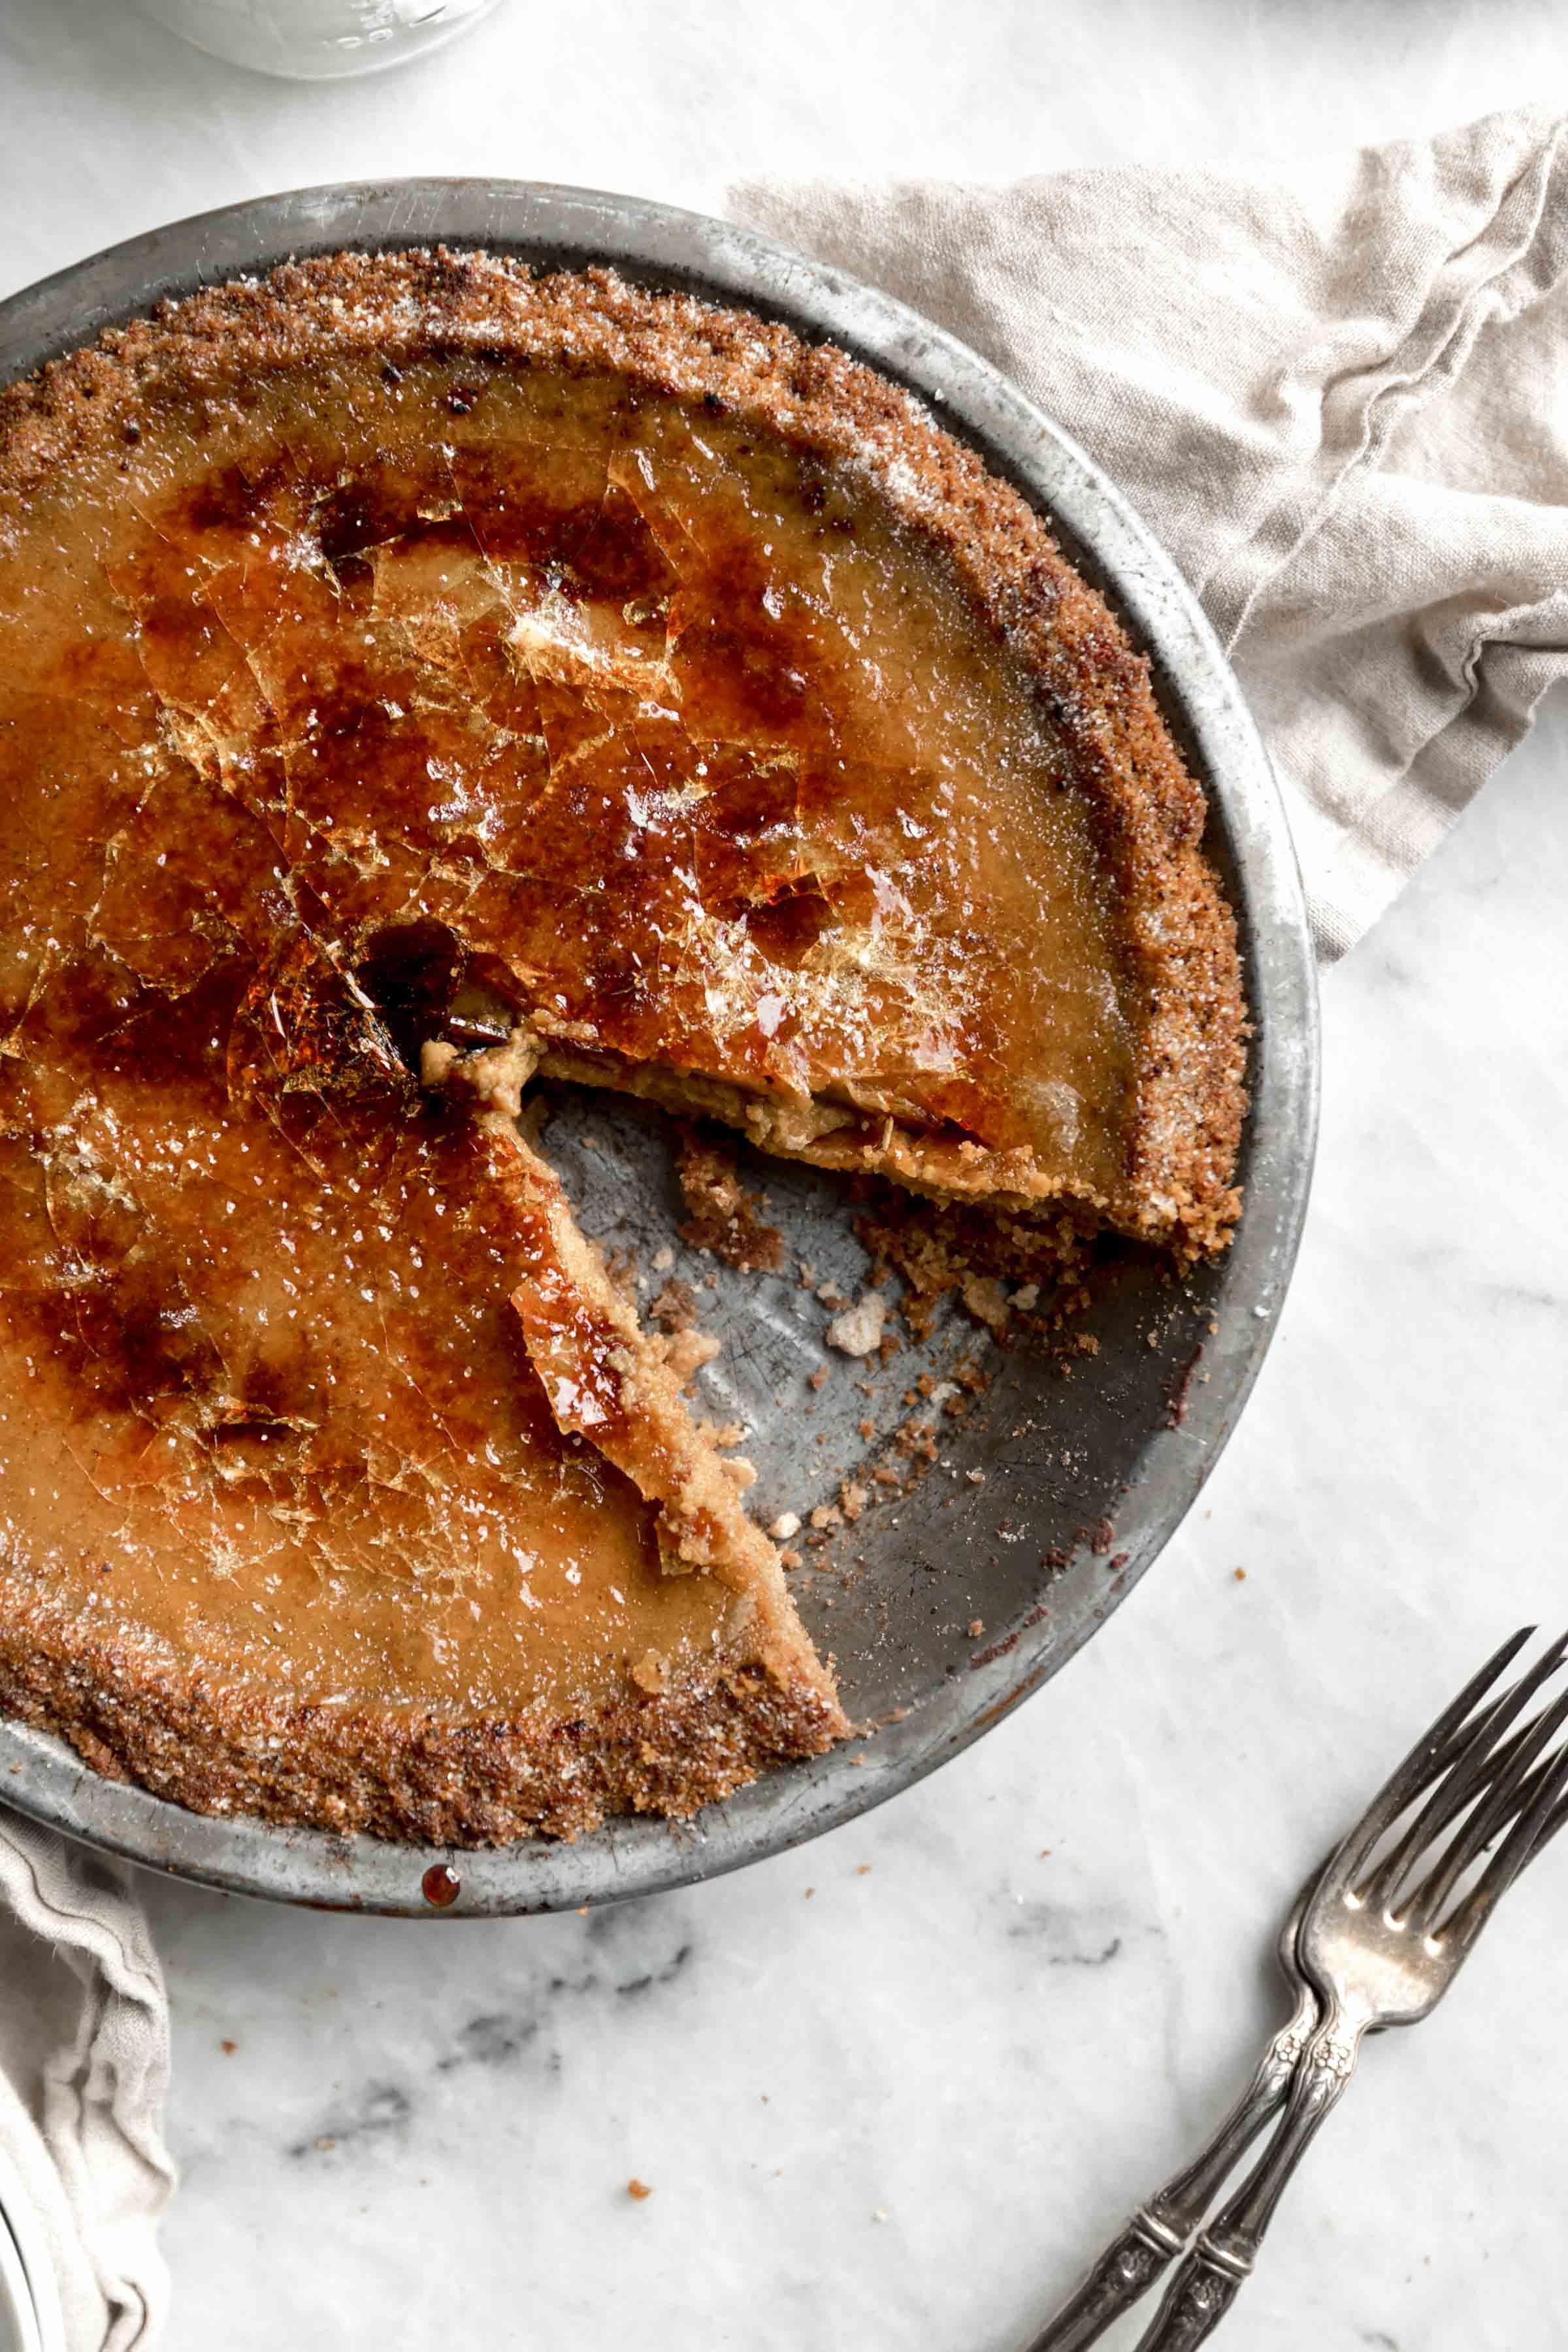 Do you like creme brûlée? Do you like pumpkin pie? Introducing new favorite dessert: Brûléed Pumpkin Pie. Creamy, crunchy, and perf for Thanksgiving!